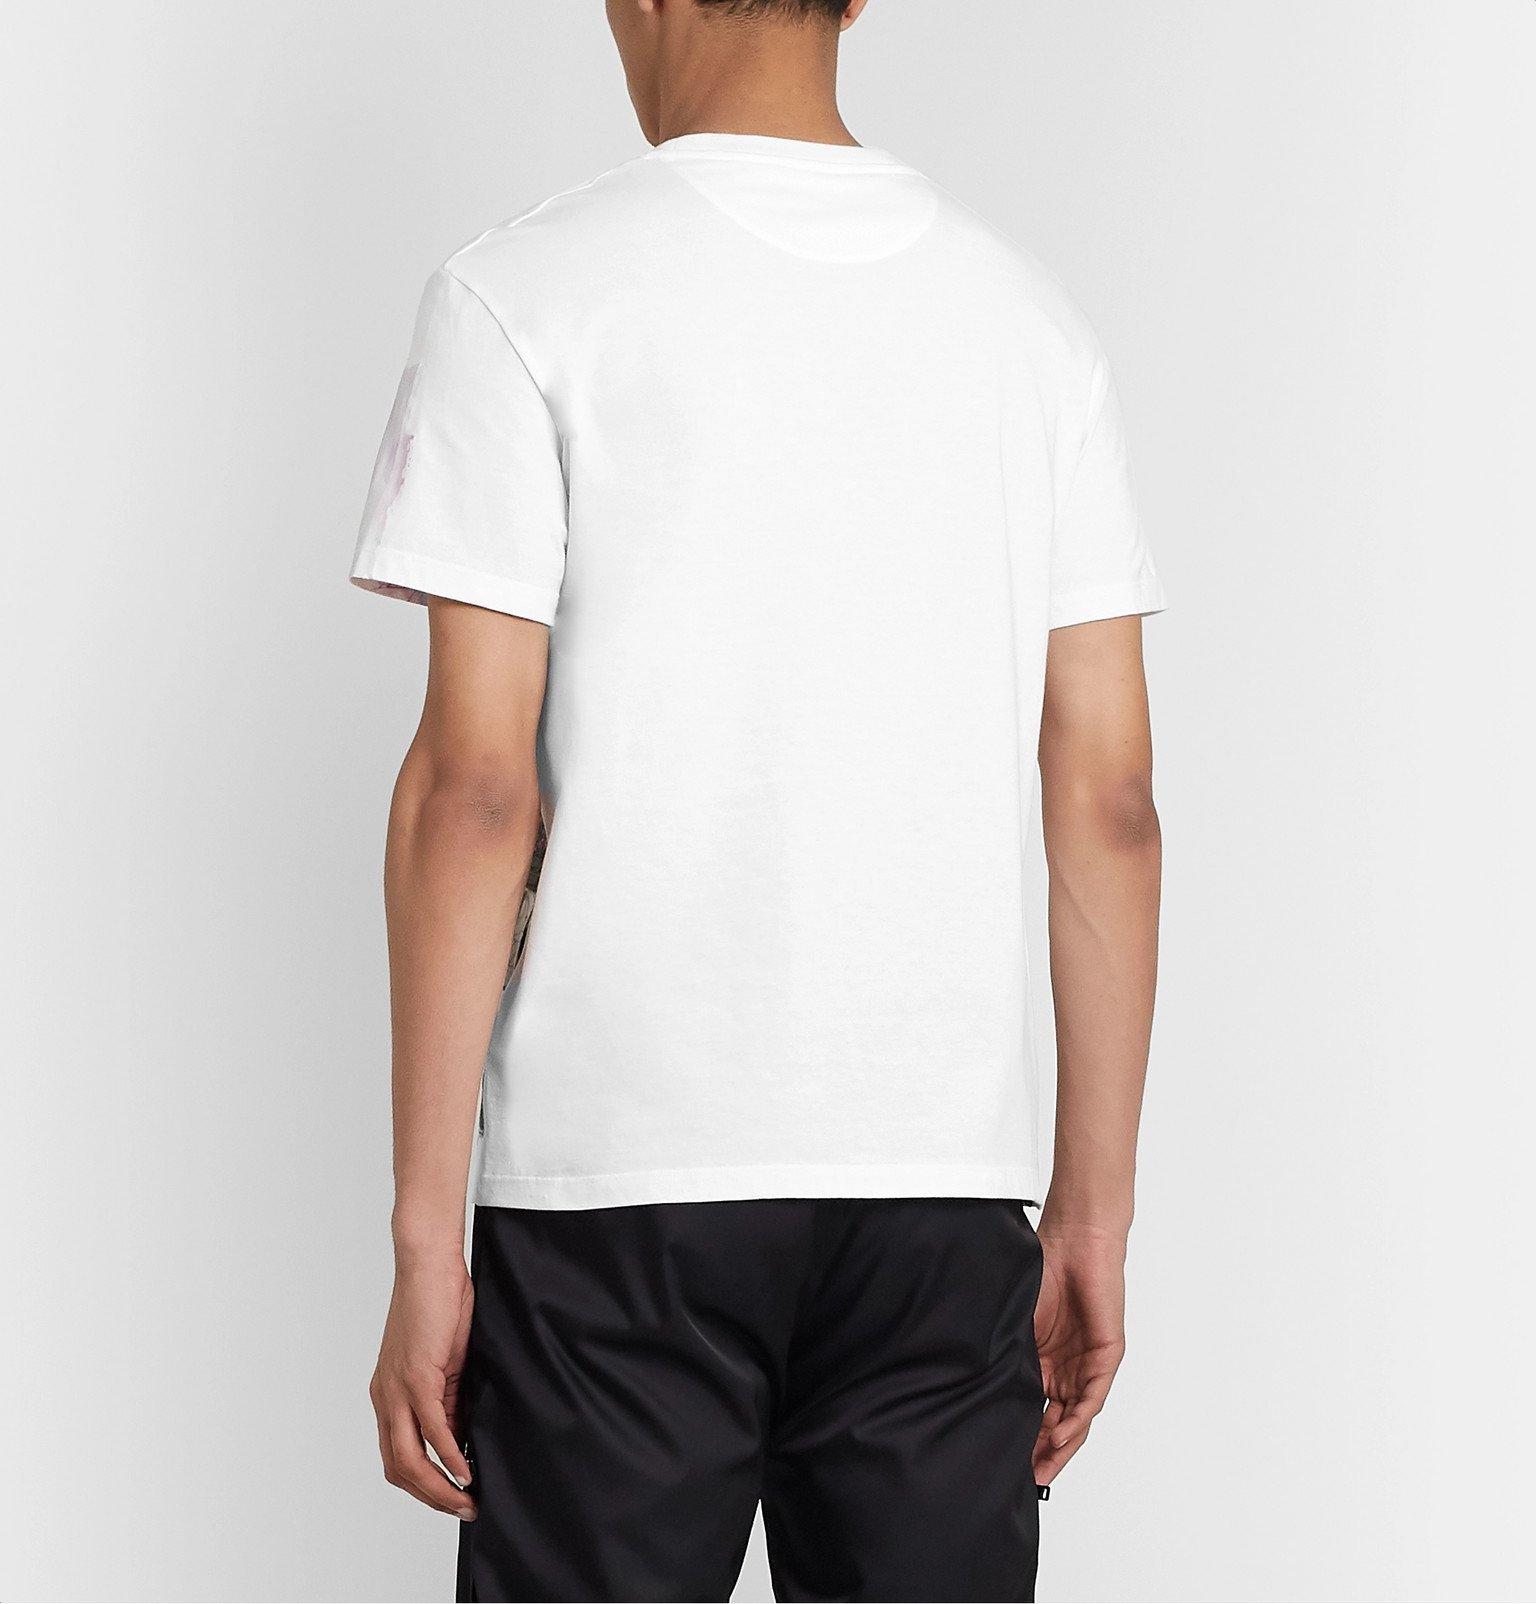 Valentino - Slim-Fit Printed Cotton-Jersey T-Shirt - White